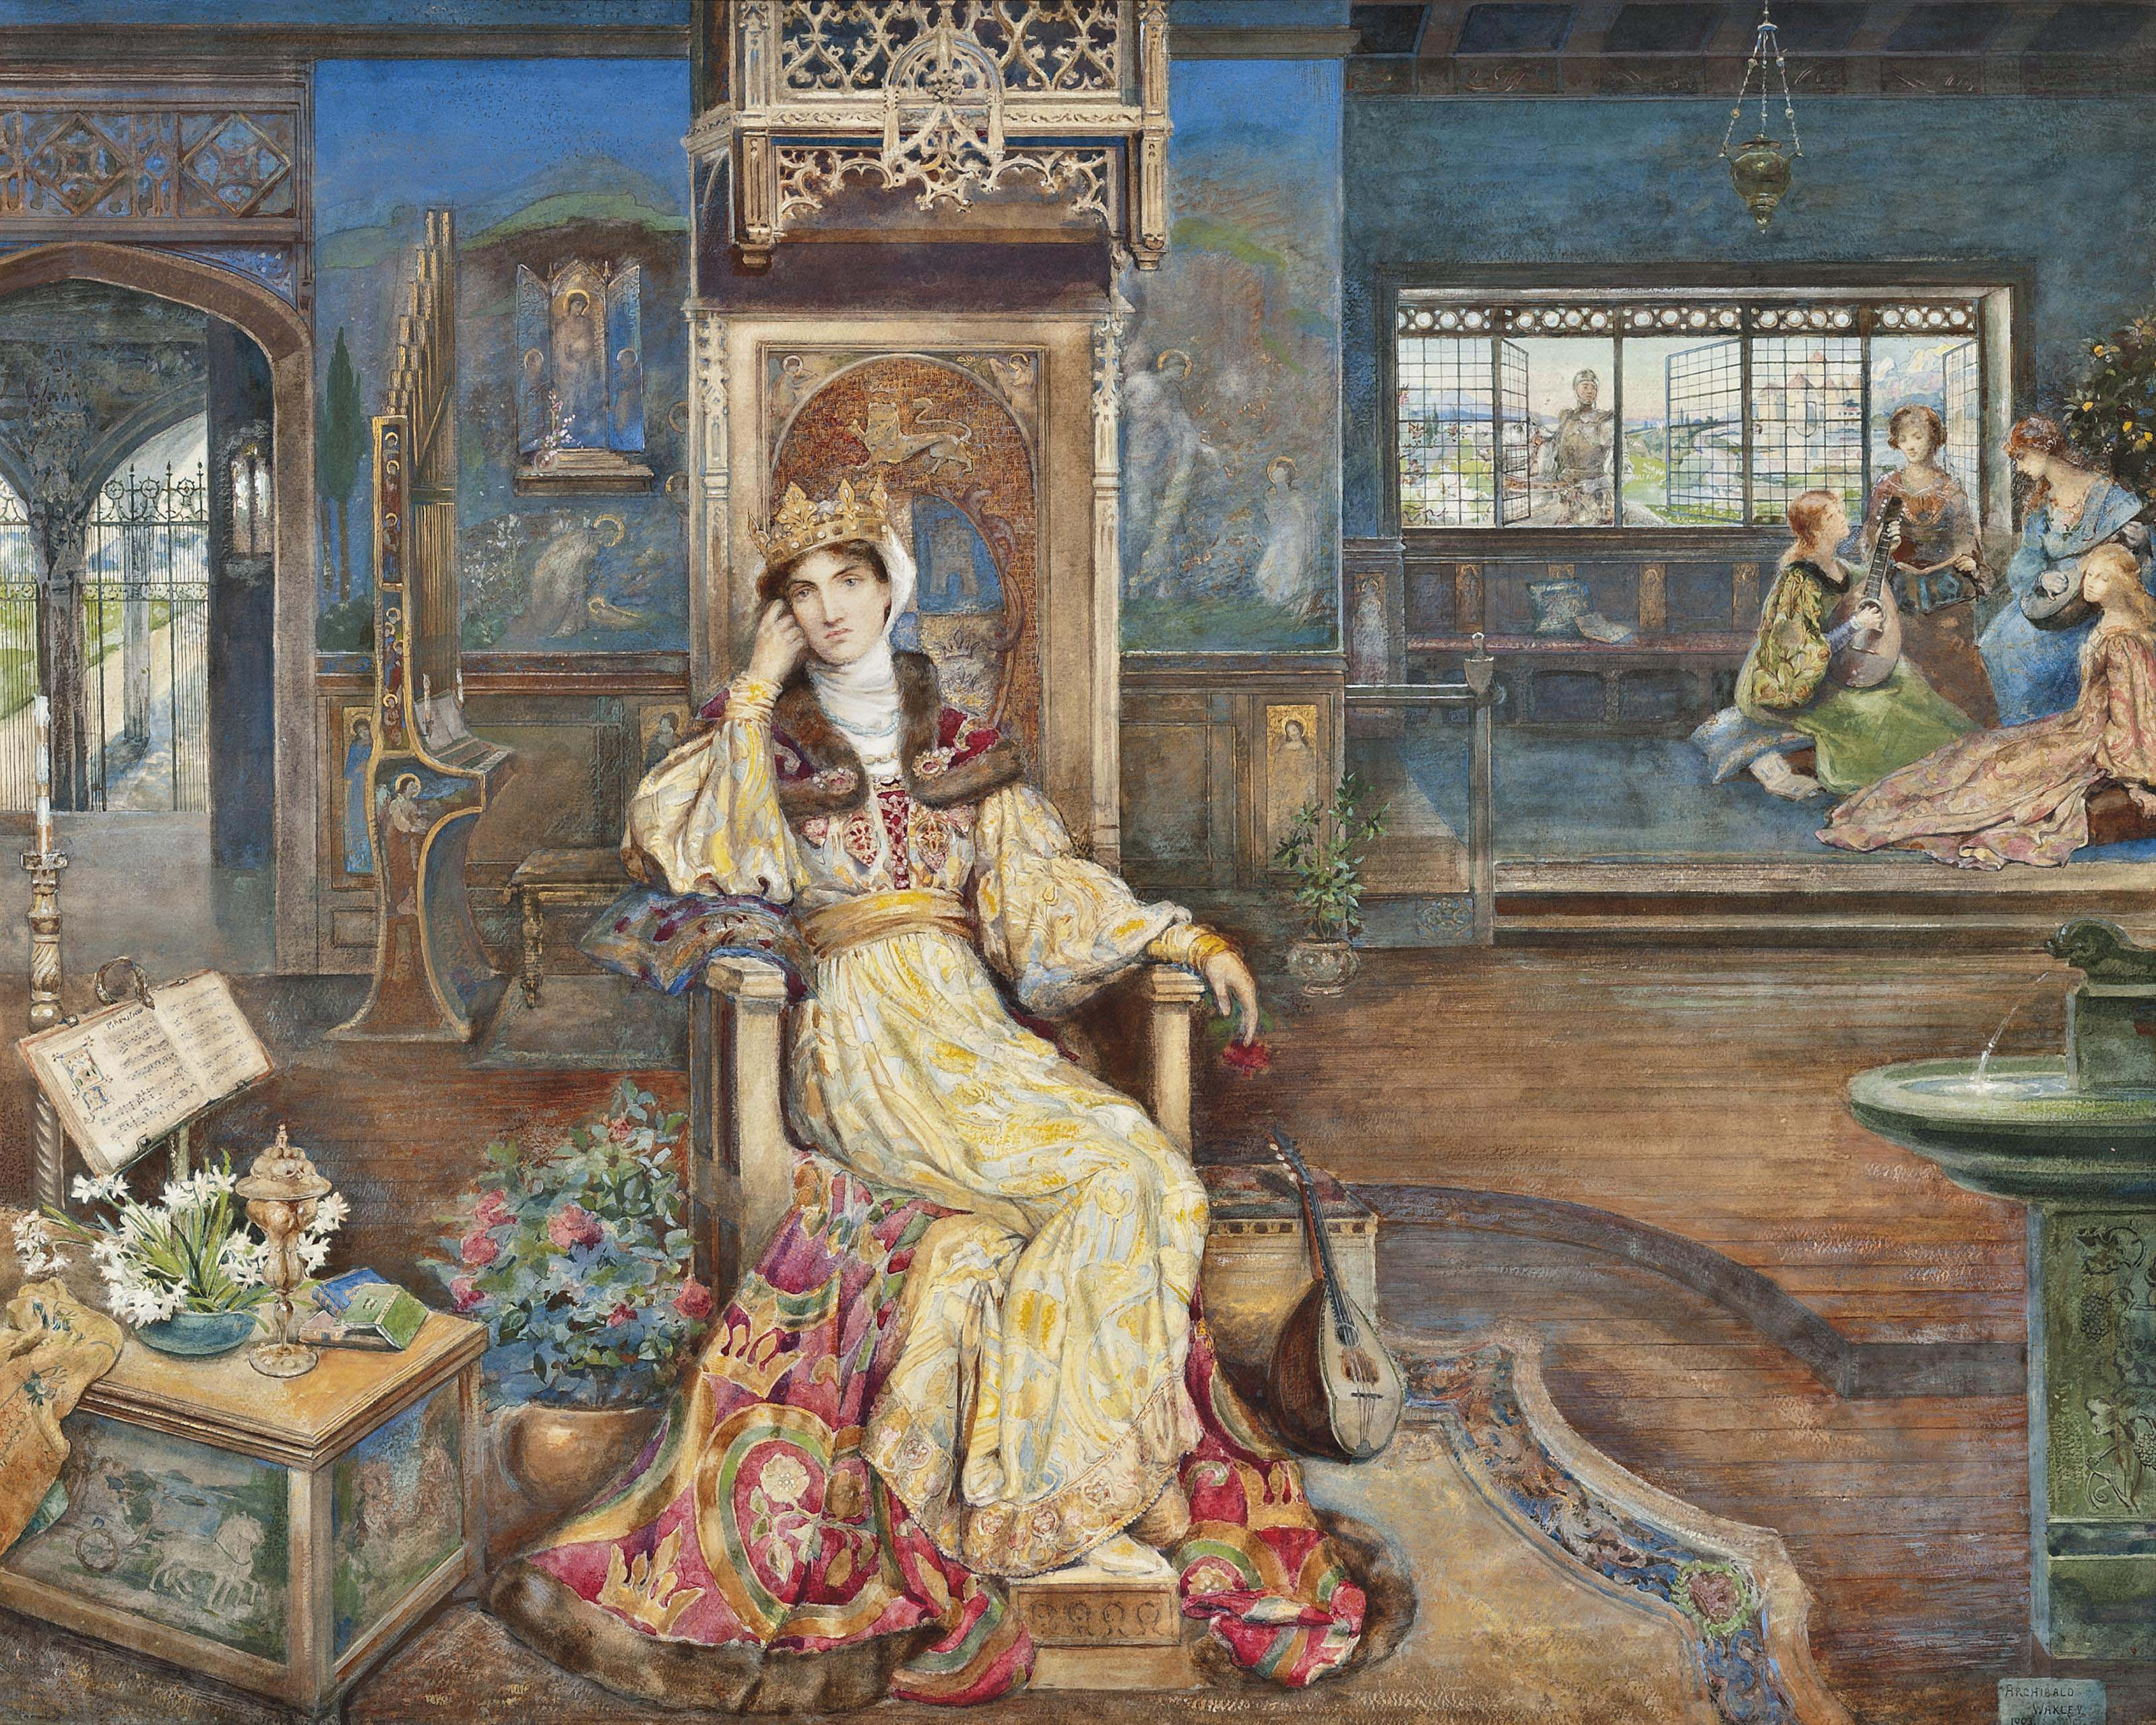 Archibald Wakley (1873-1906)